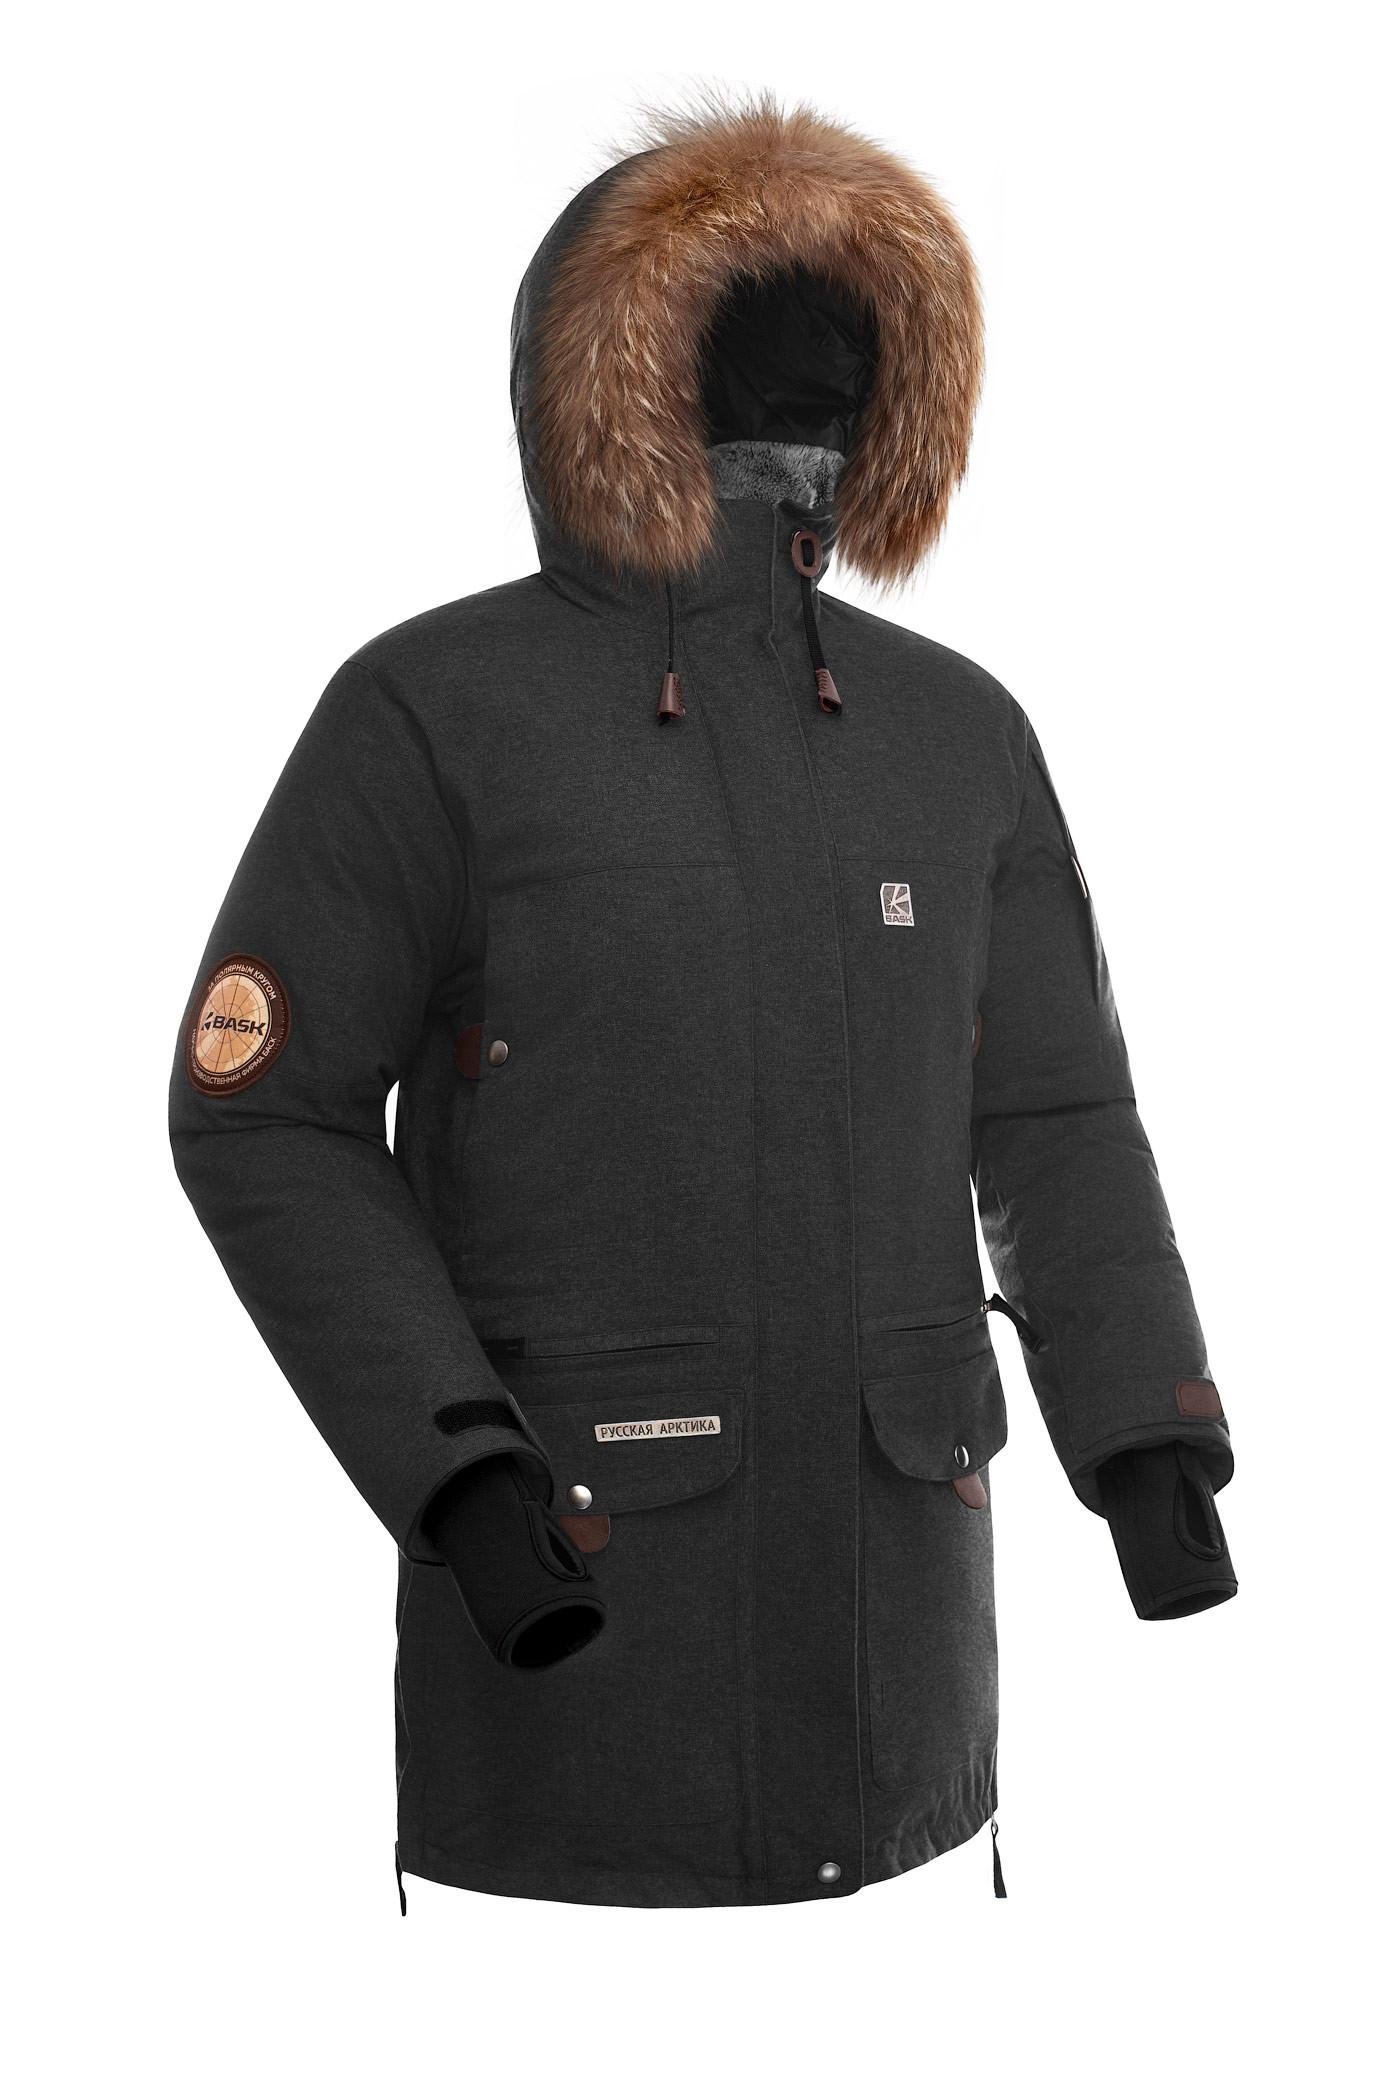 99b46f870d5 Куртка пуховая BASK IREMEL SOFT черная